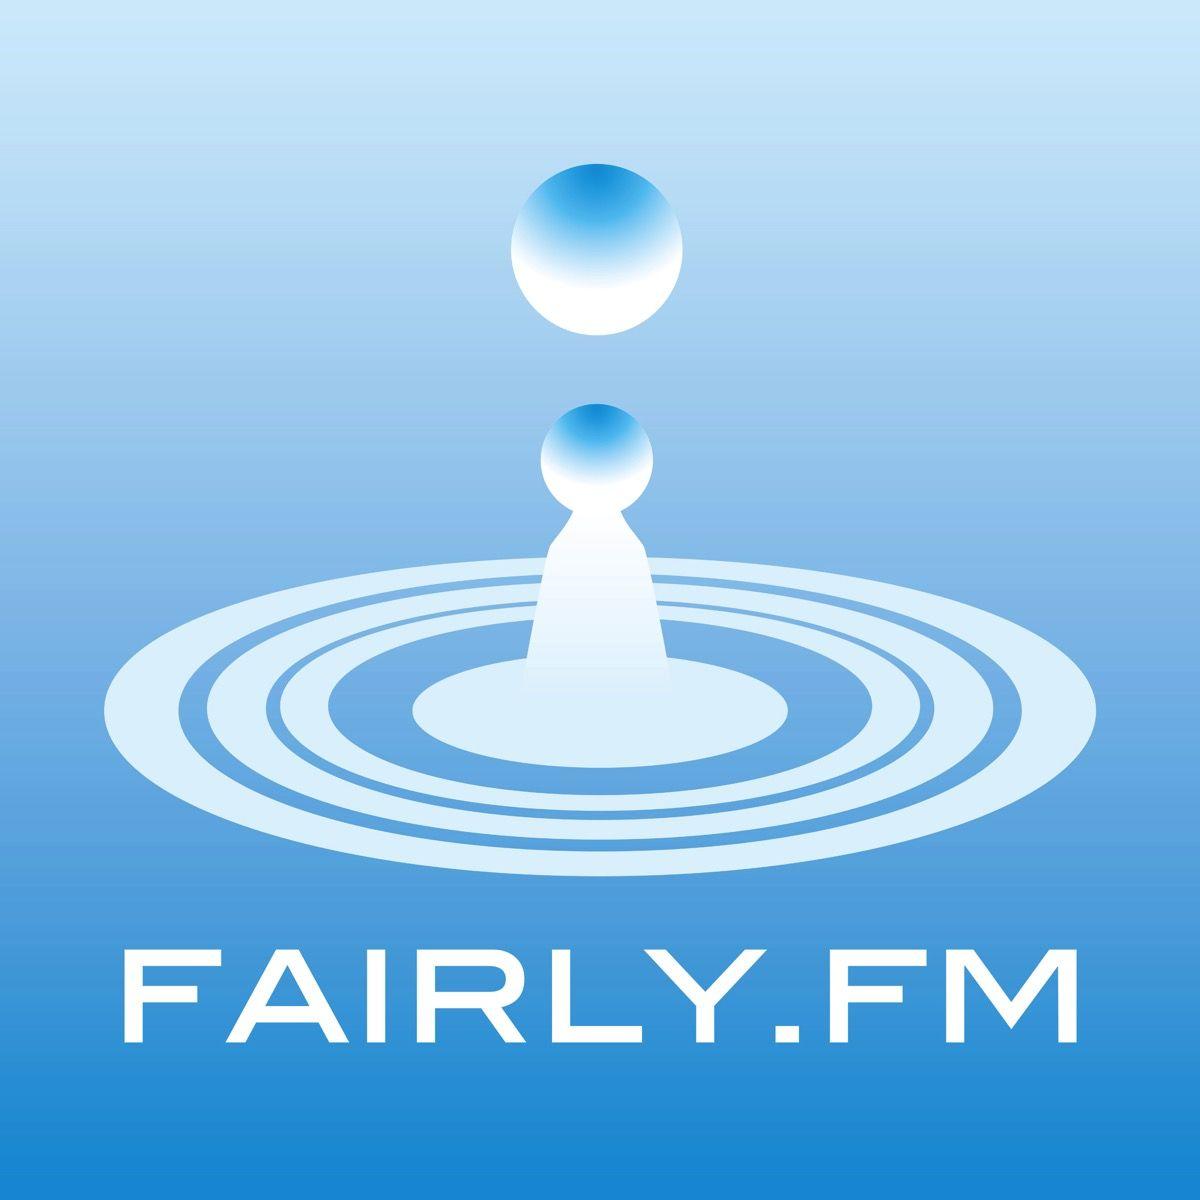 Fairly fm logo